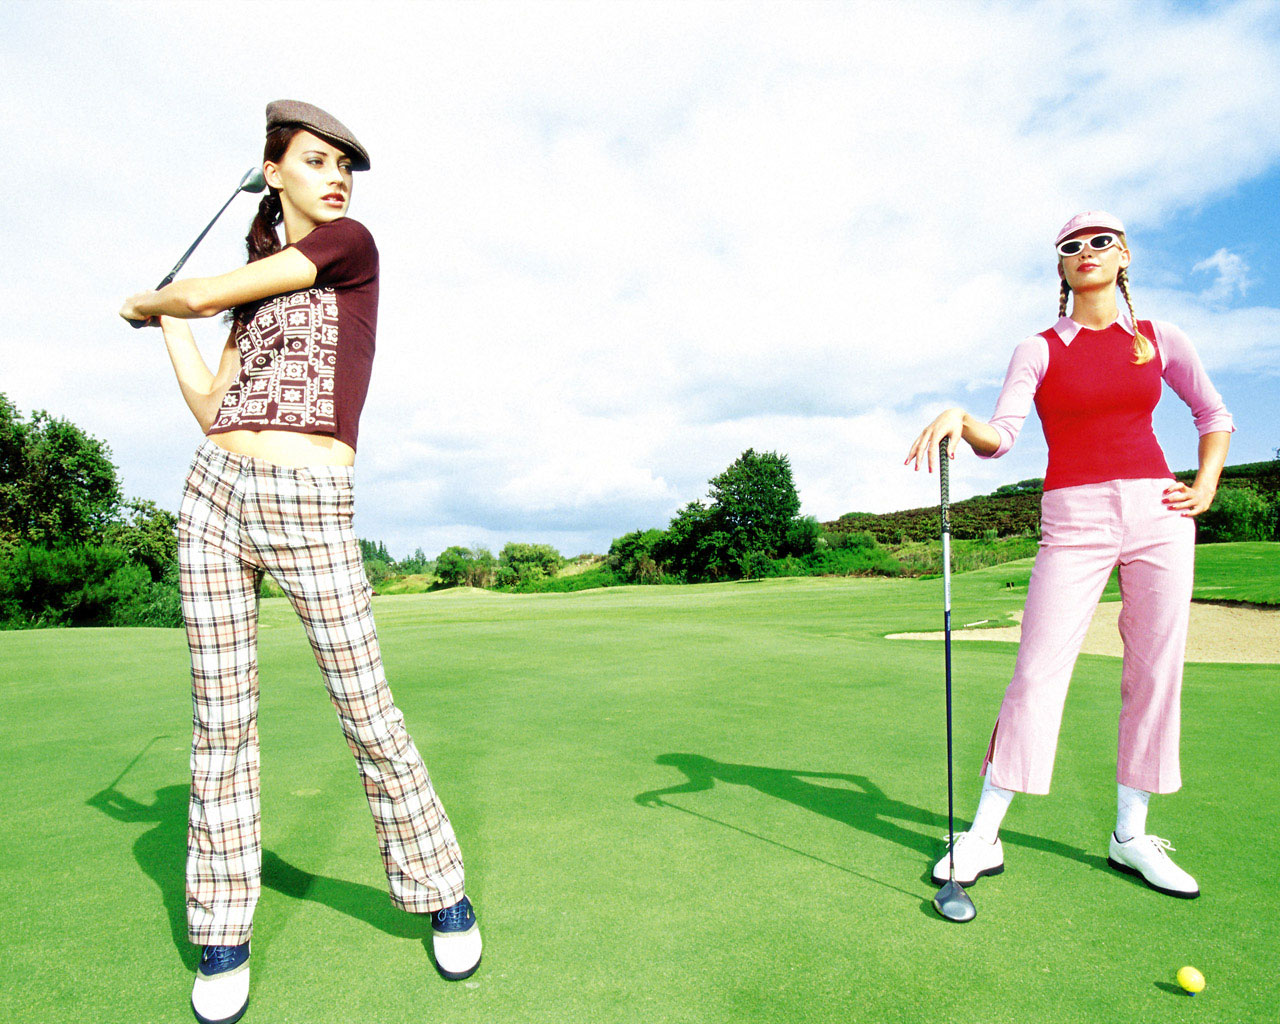 hd sport wallpapers golf. Black Bedroom Furniture Sets. Home Design Ideas